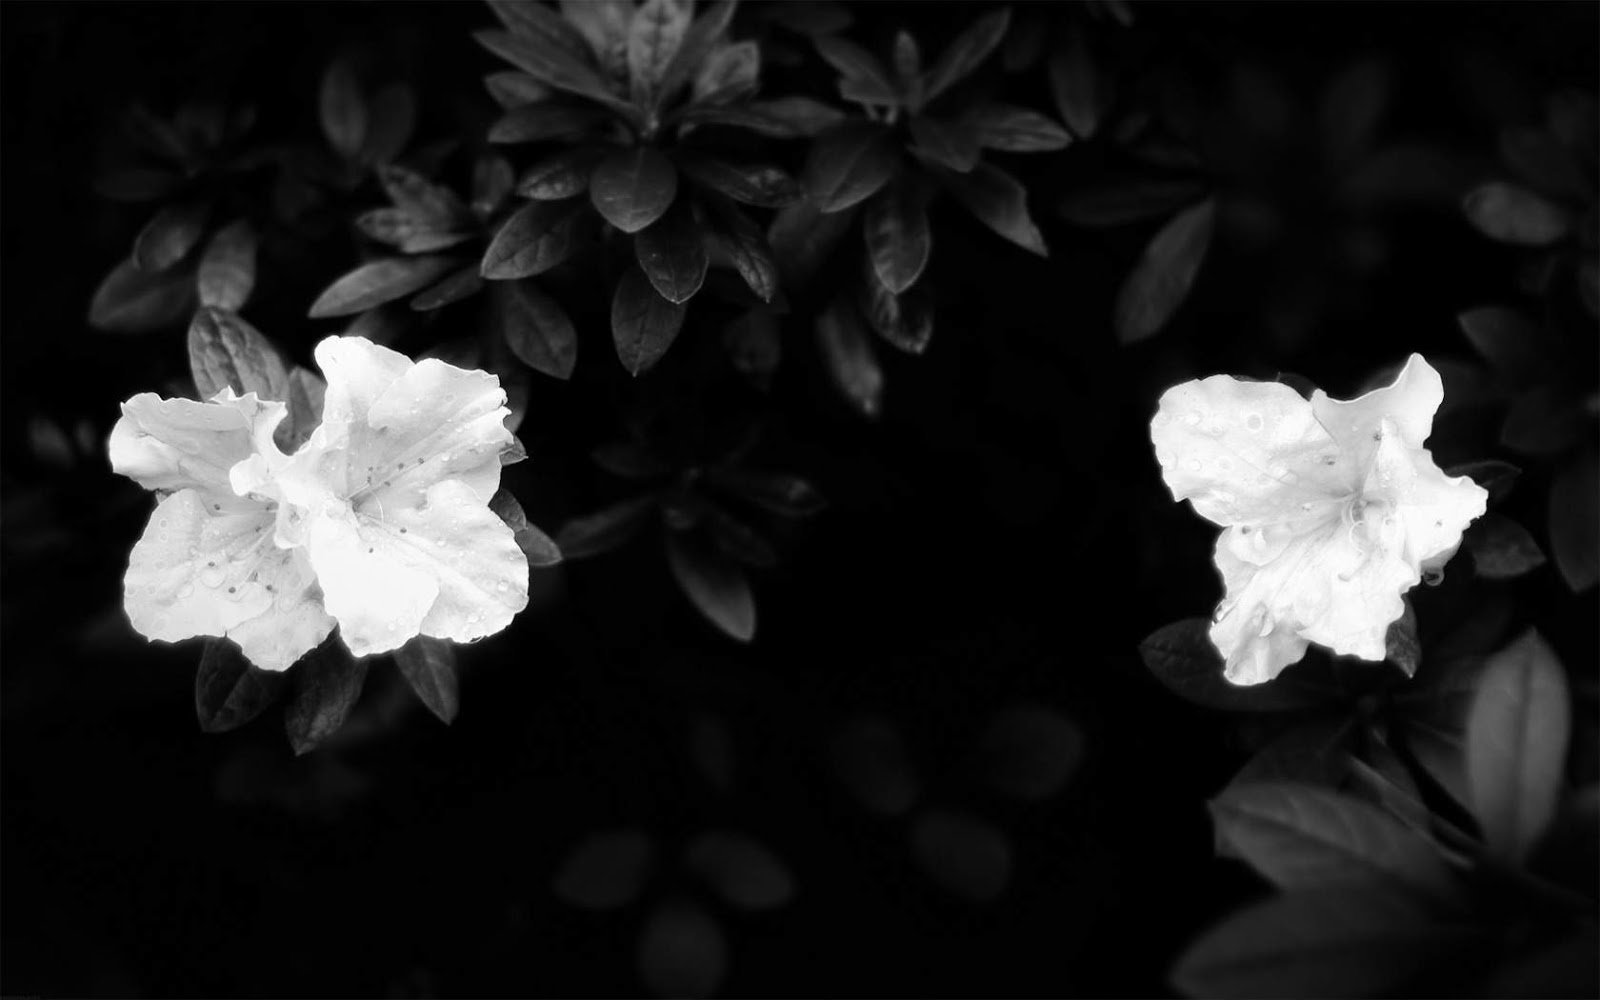 Black Wallpaper With White Flowers Wallpapersafari